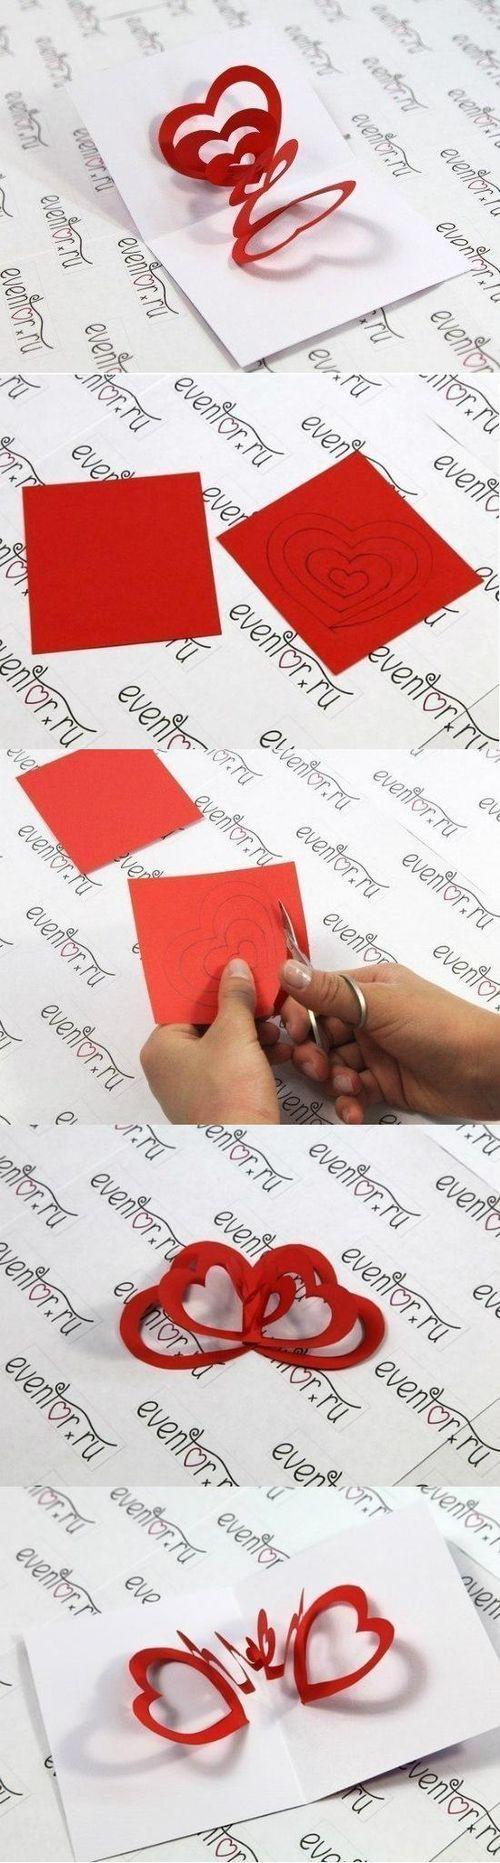 DIY Valentines Card DIY Projects / UsefulDIY.com on imgfave